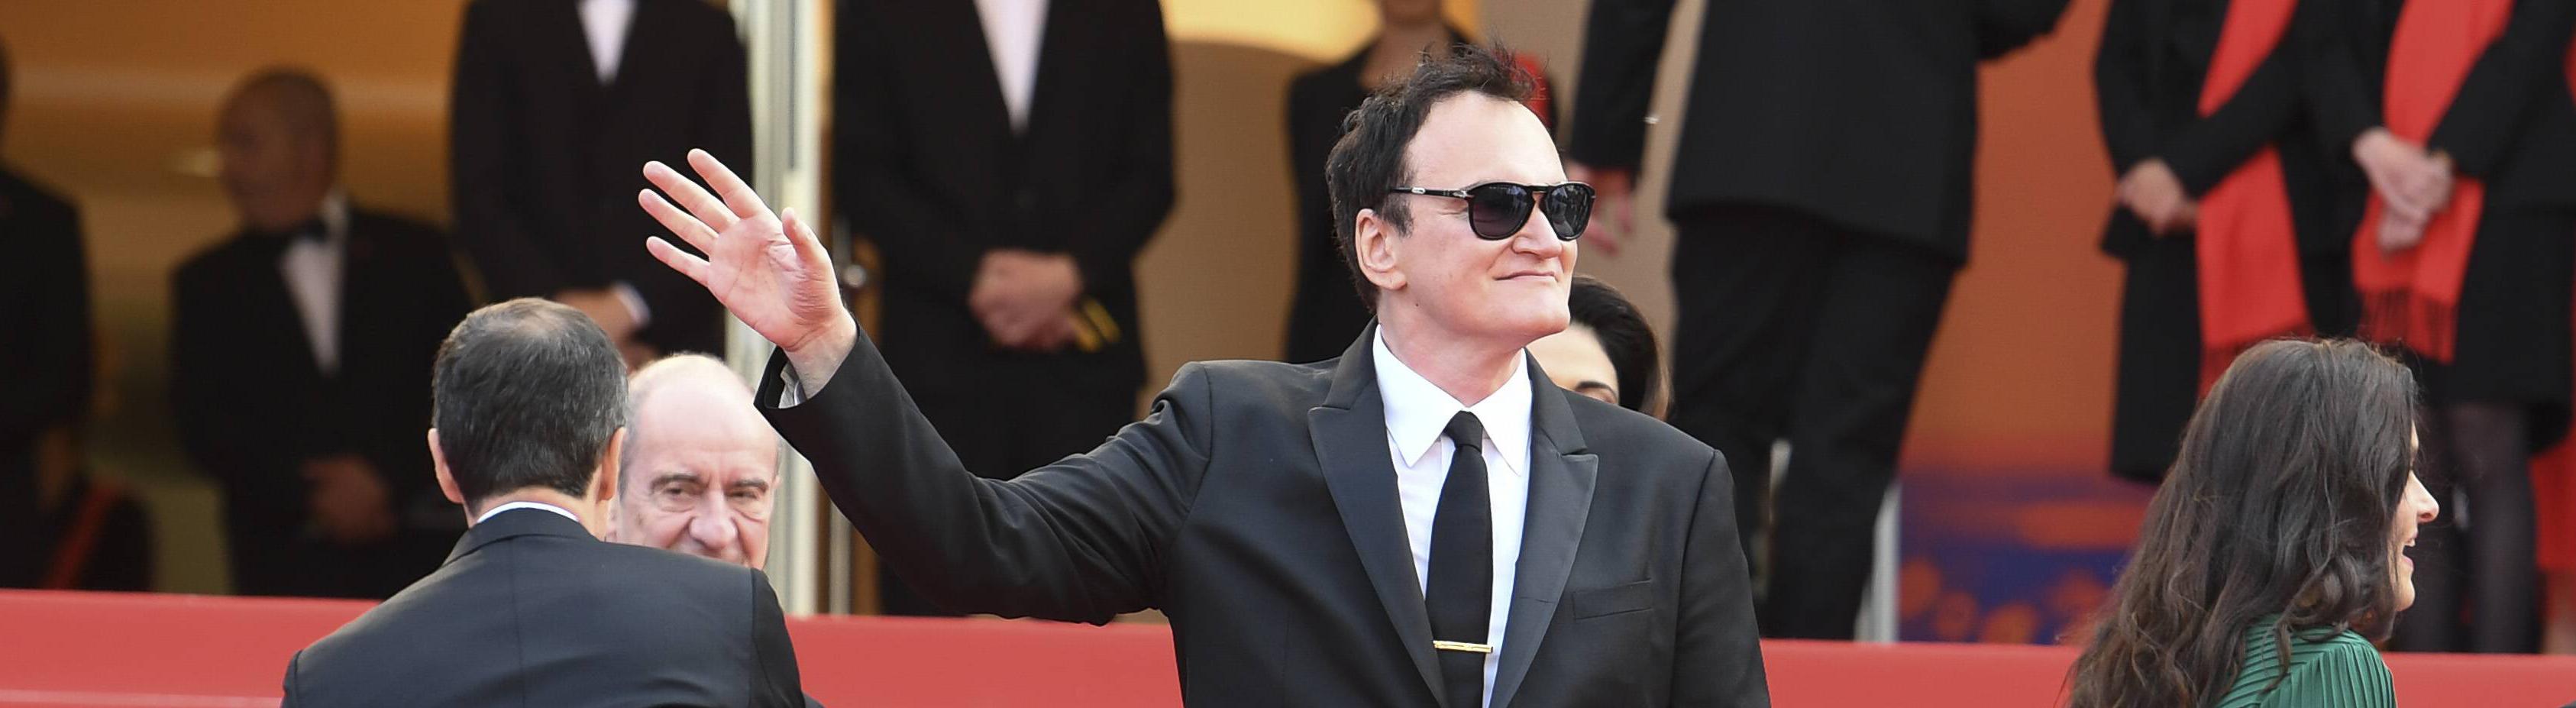 Quentin Tarentino 2019 in Cannes